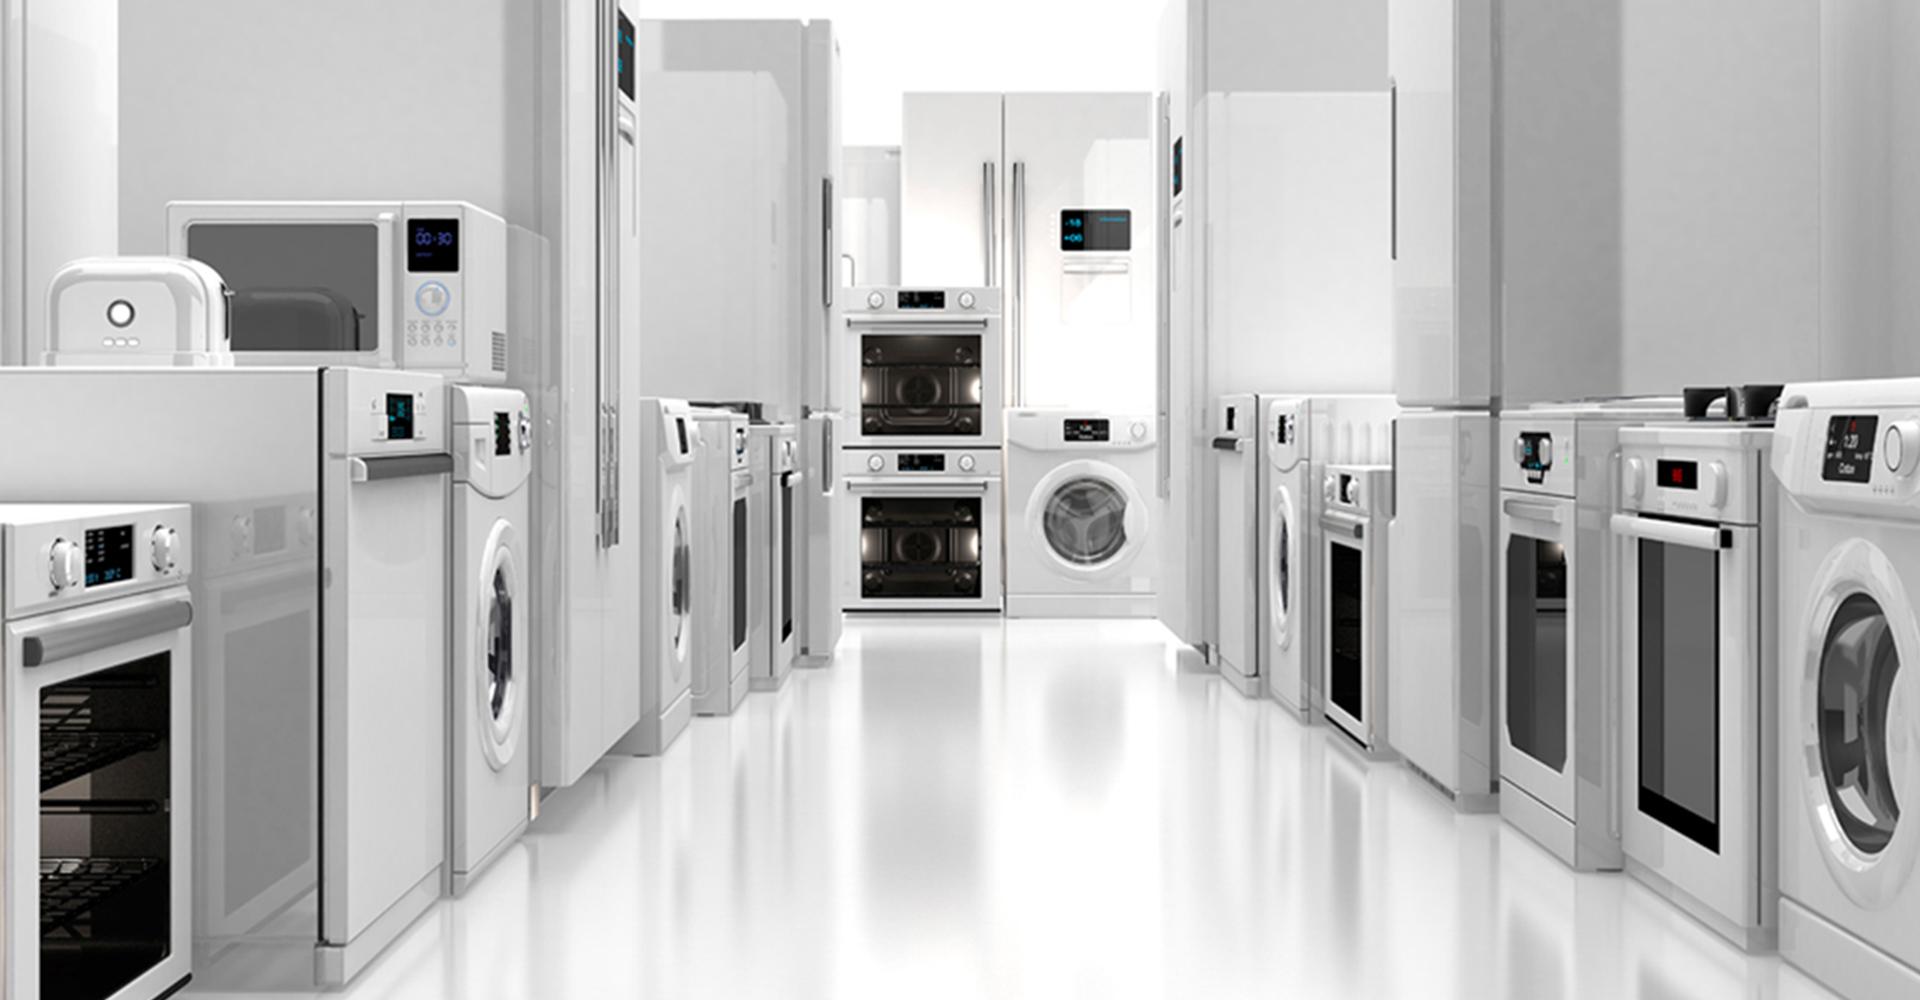 dash kitchen appliances natural wood cabinets home appliance service